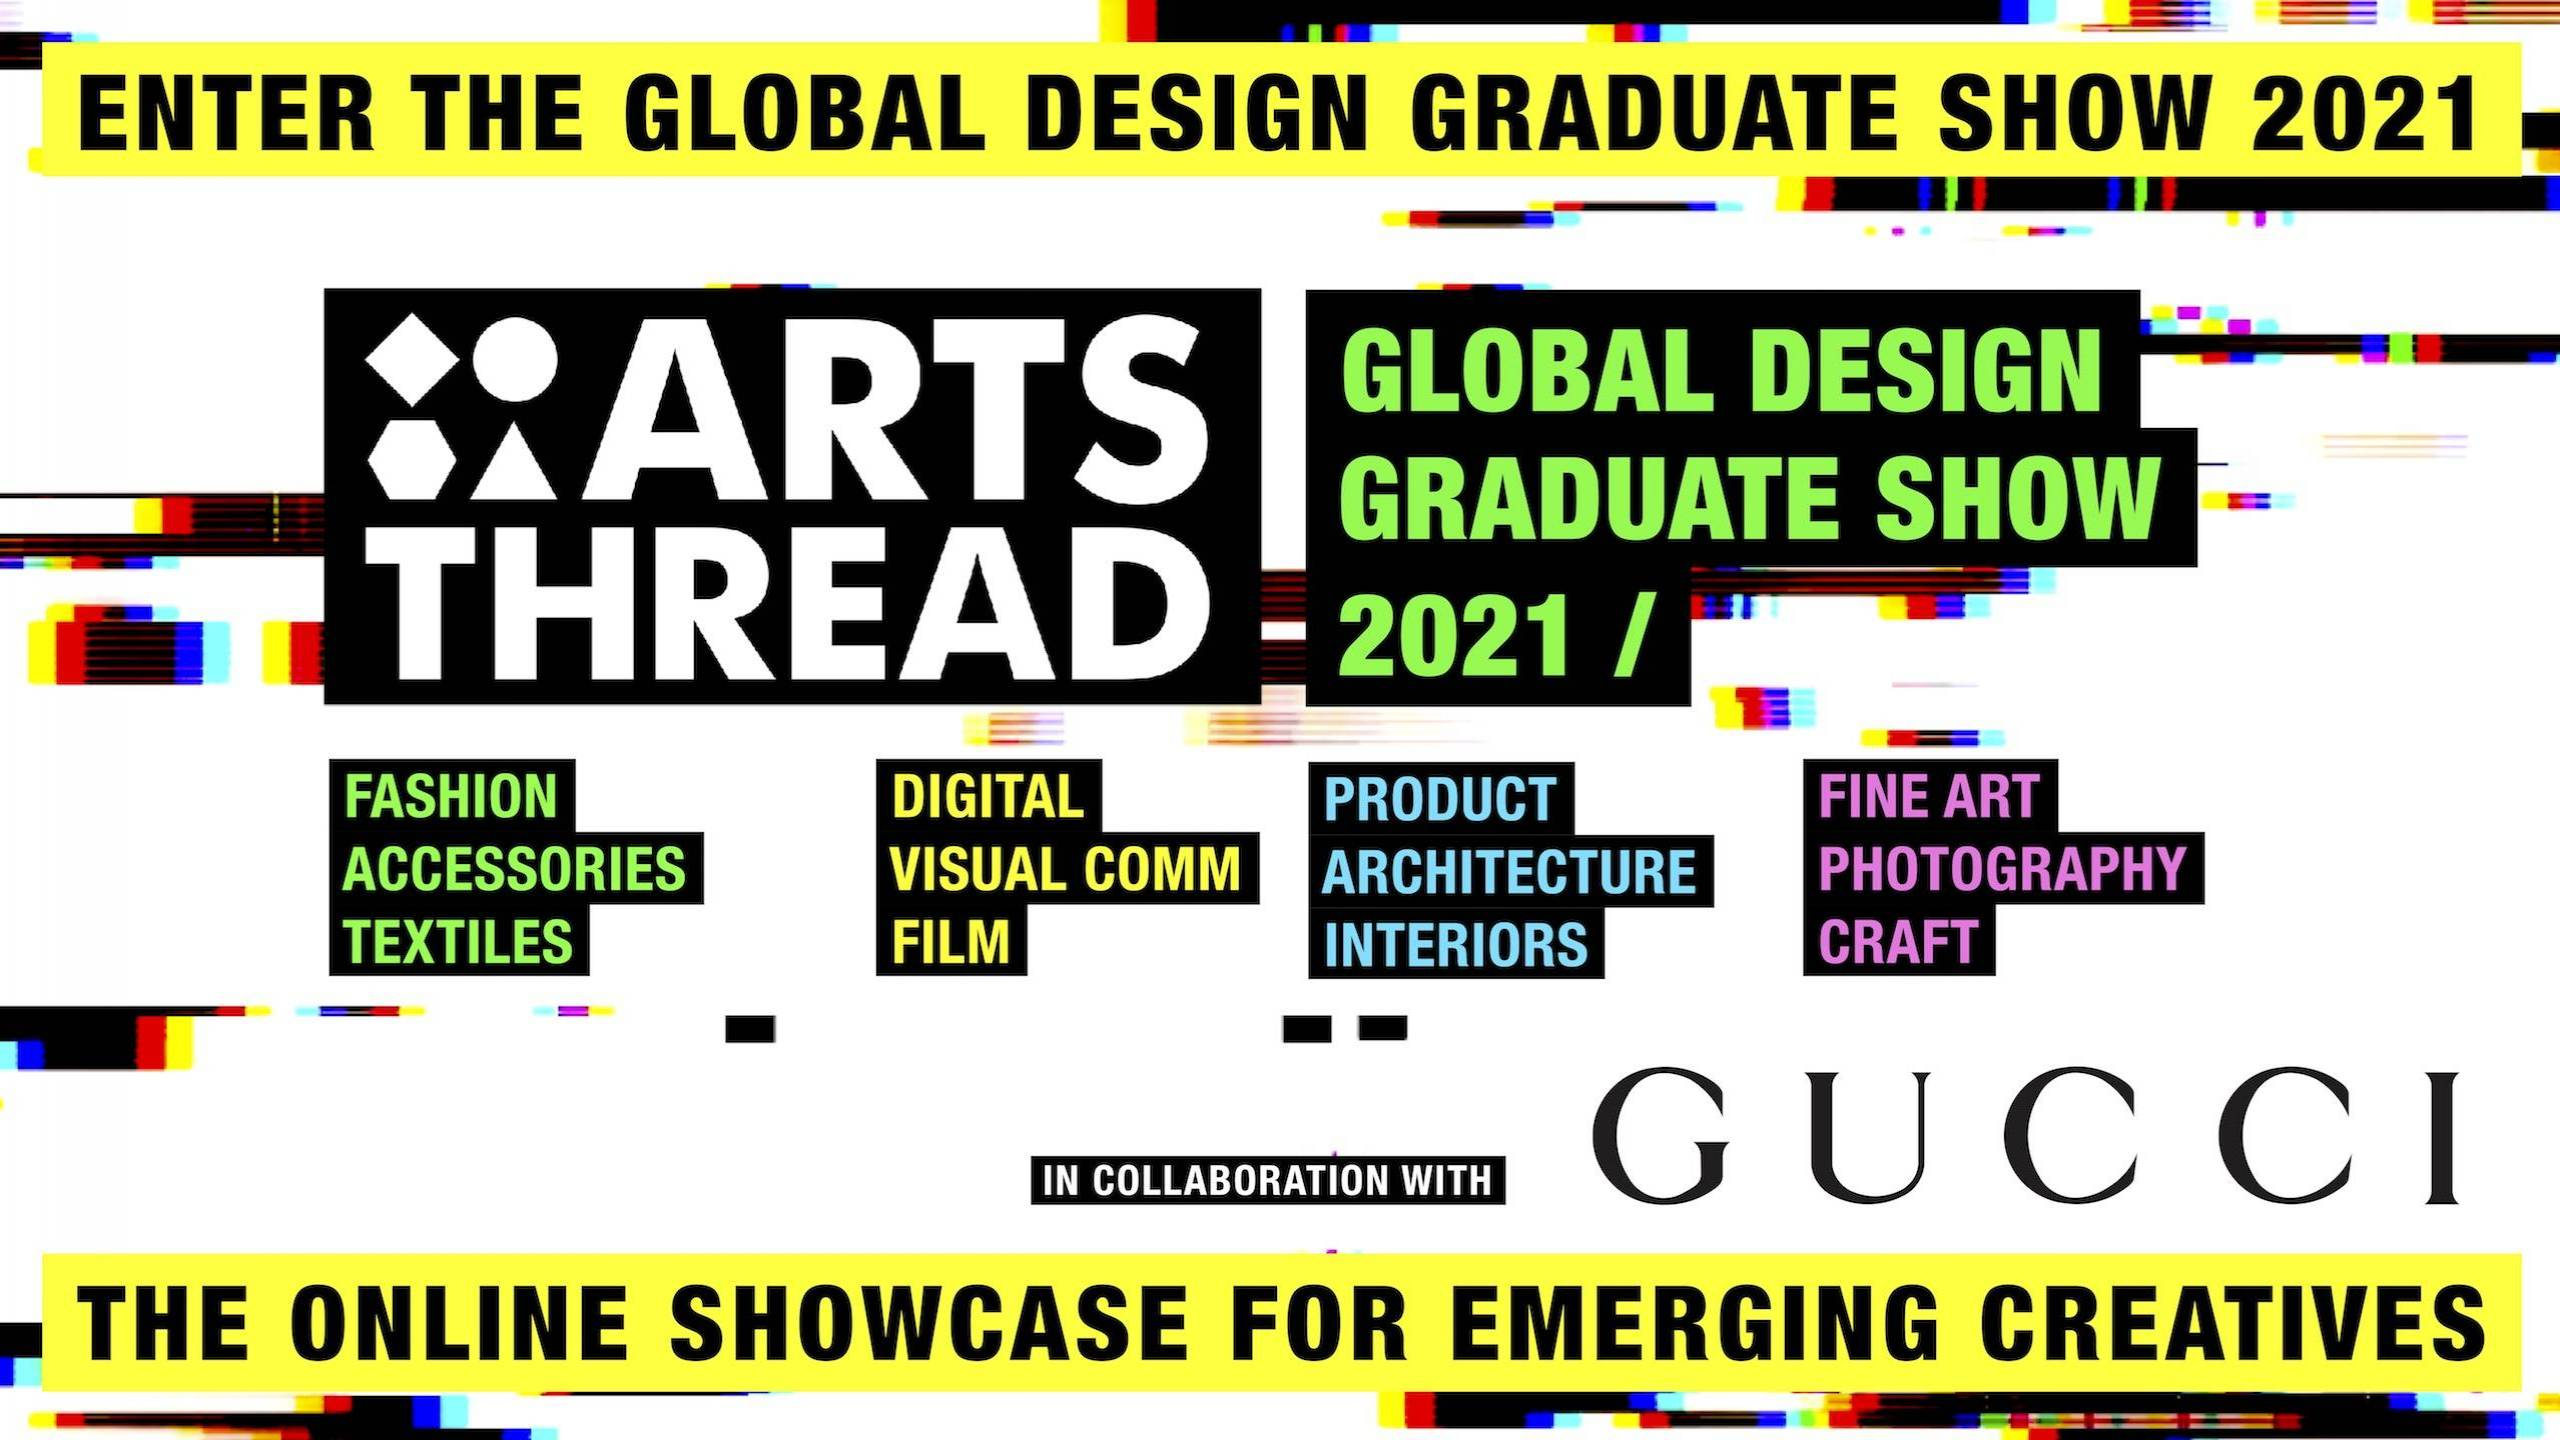 GLOBAL DESIGN GRADUATE SHOW 2021